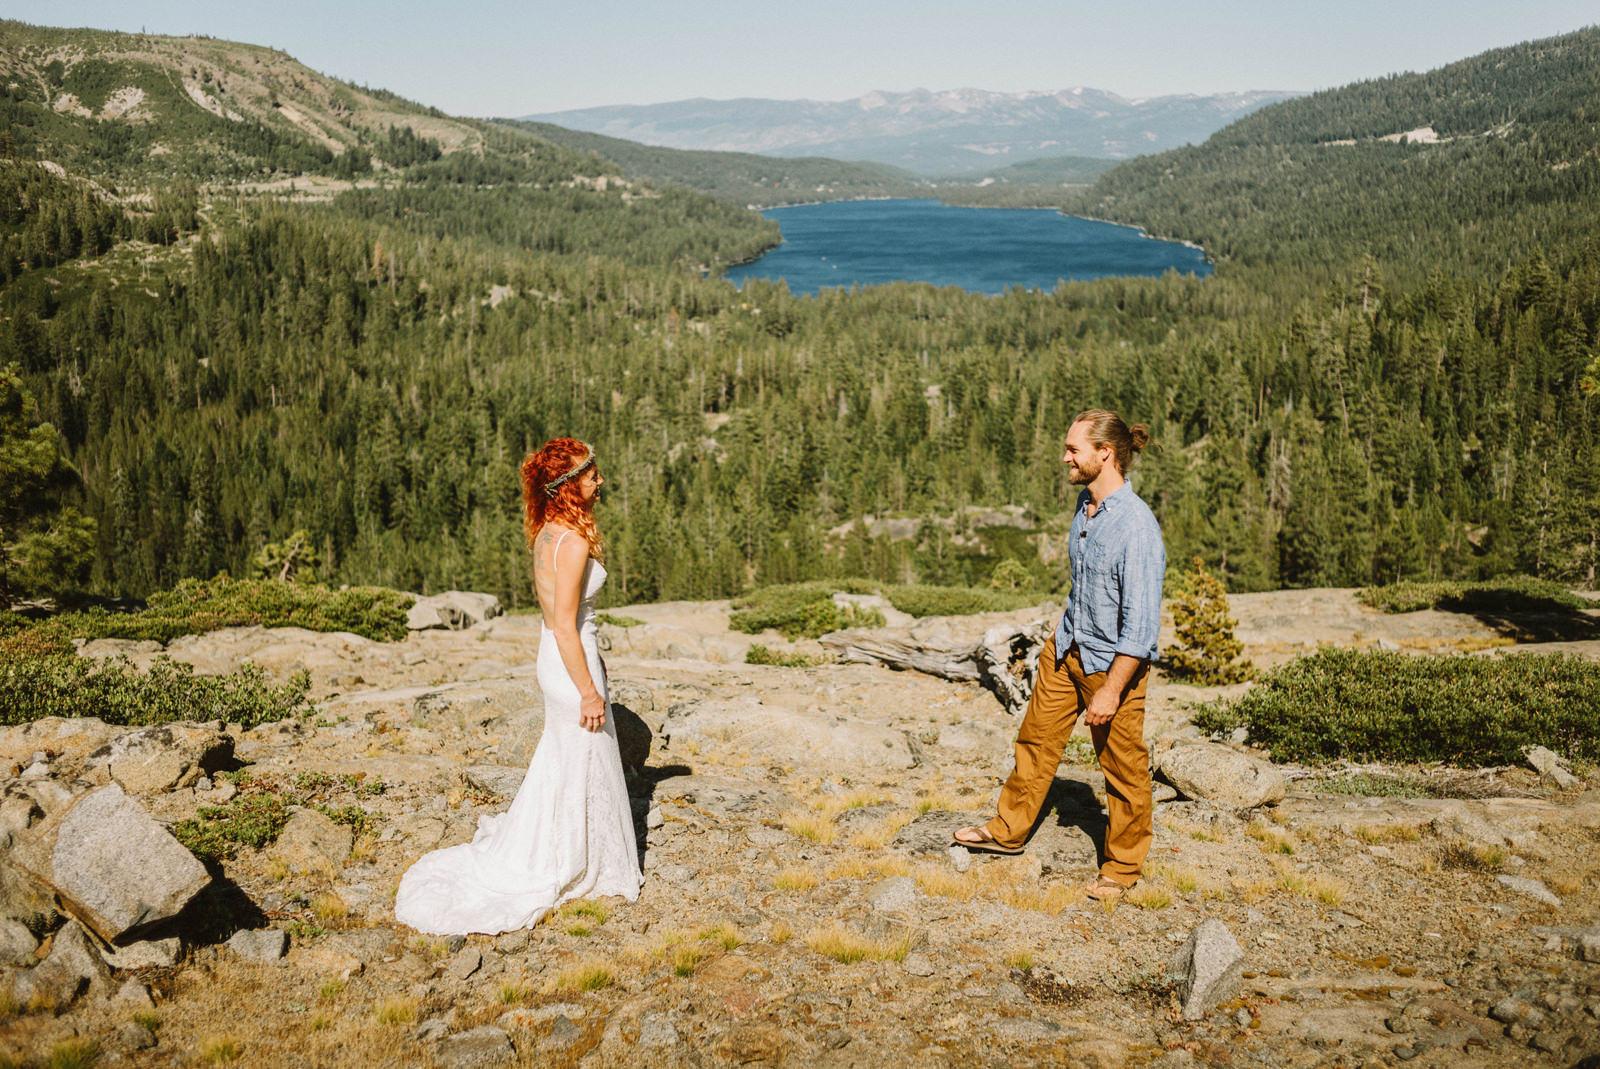 lake-tahoe-elopement-026 LAKE TAHOE ELOPEMENT